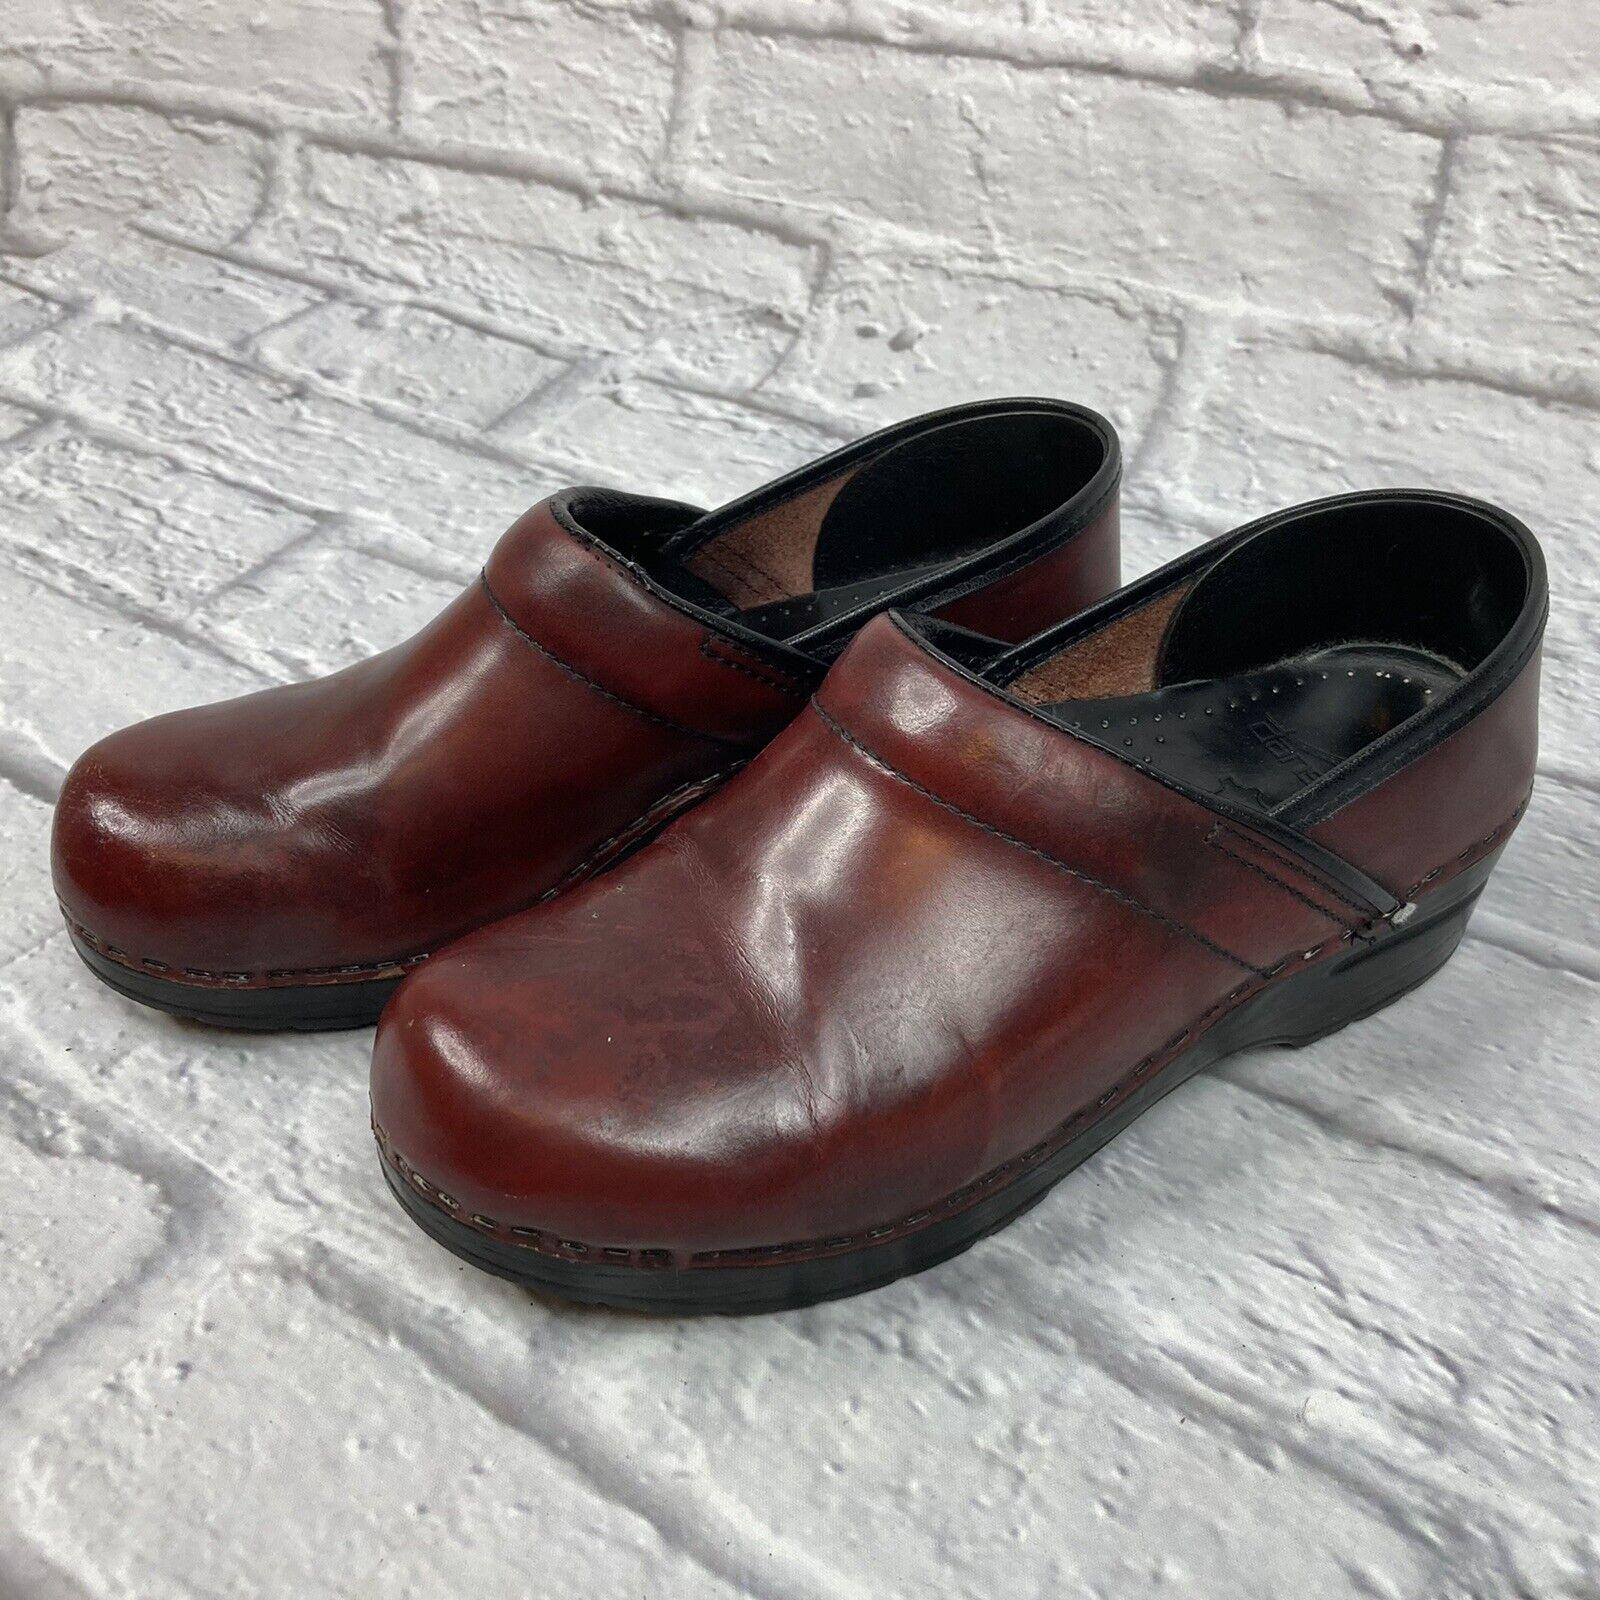 DANSKO Womens Professional Cabrio Clogs Leather Brown 0080240 Size 39 / 8.5-9